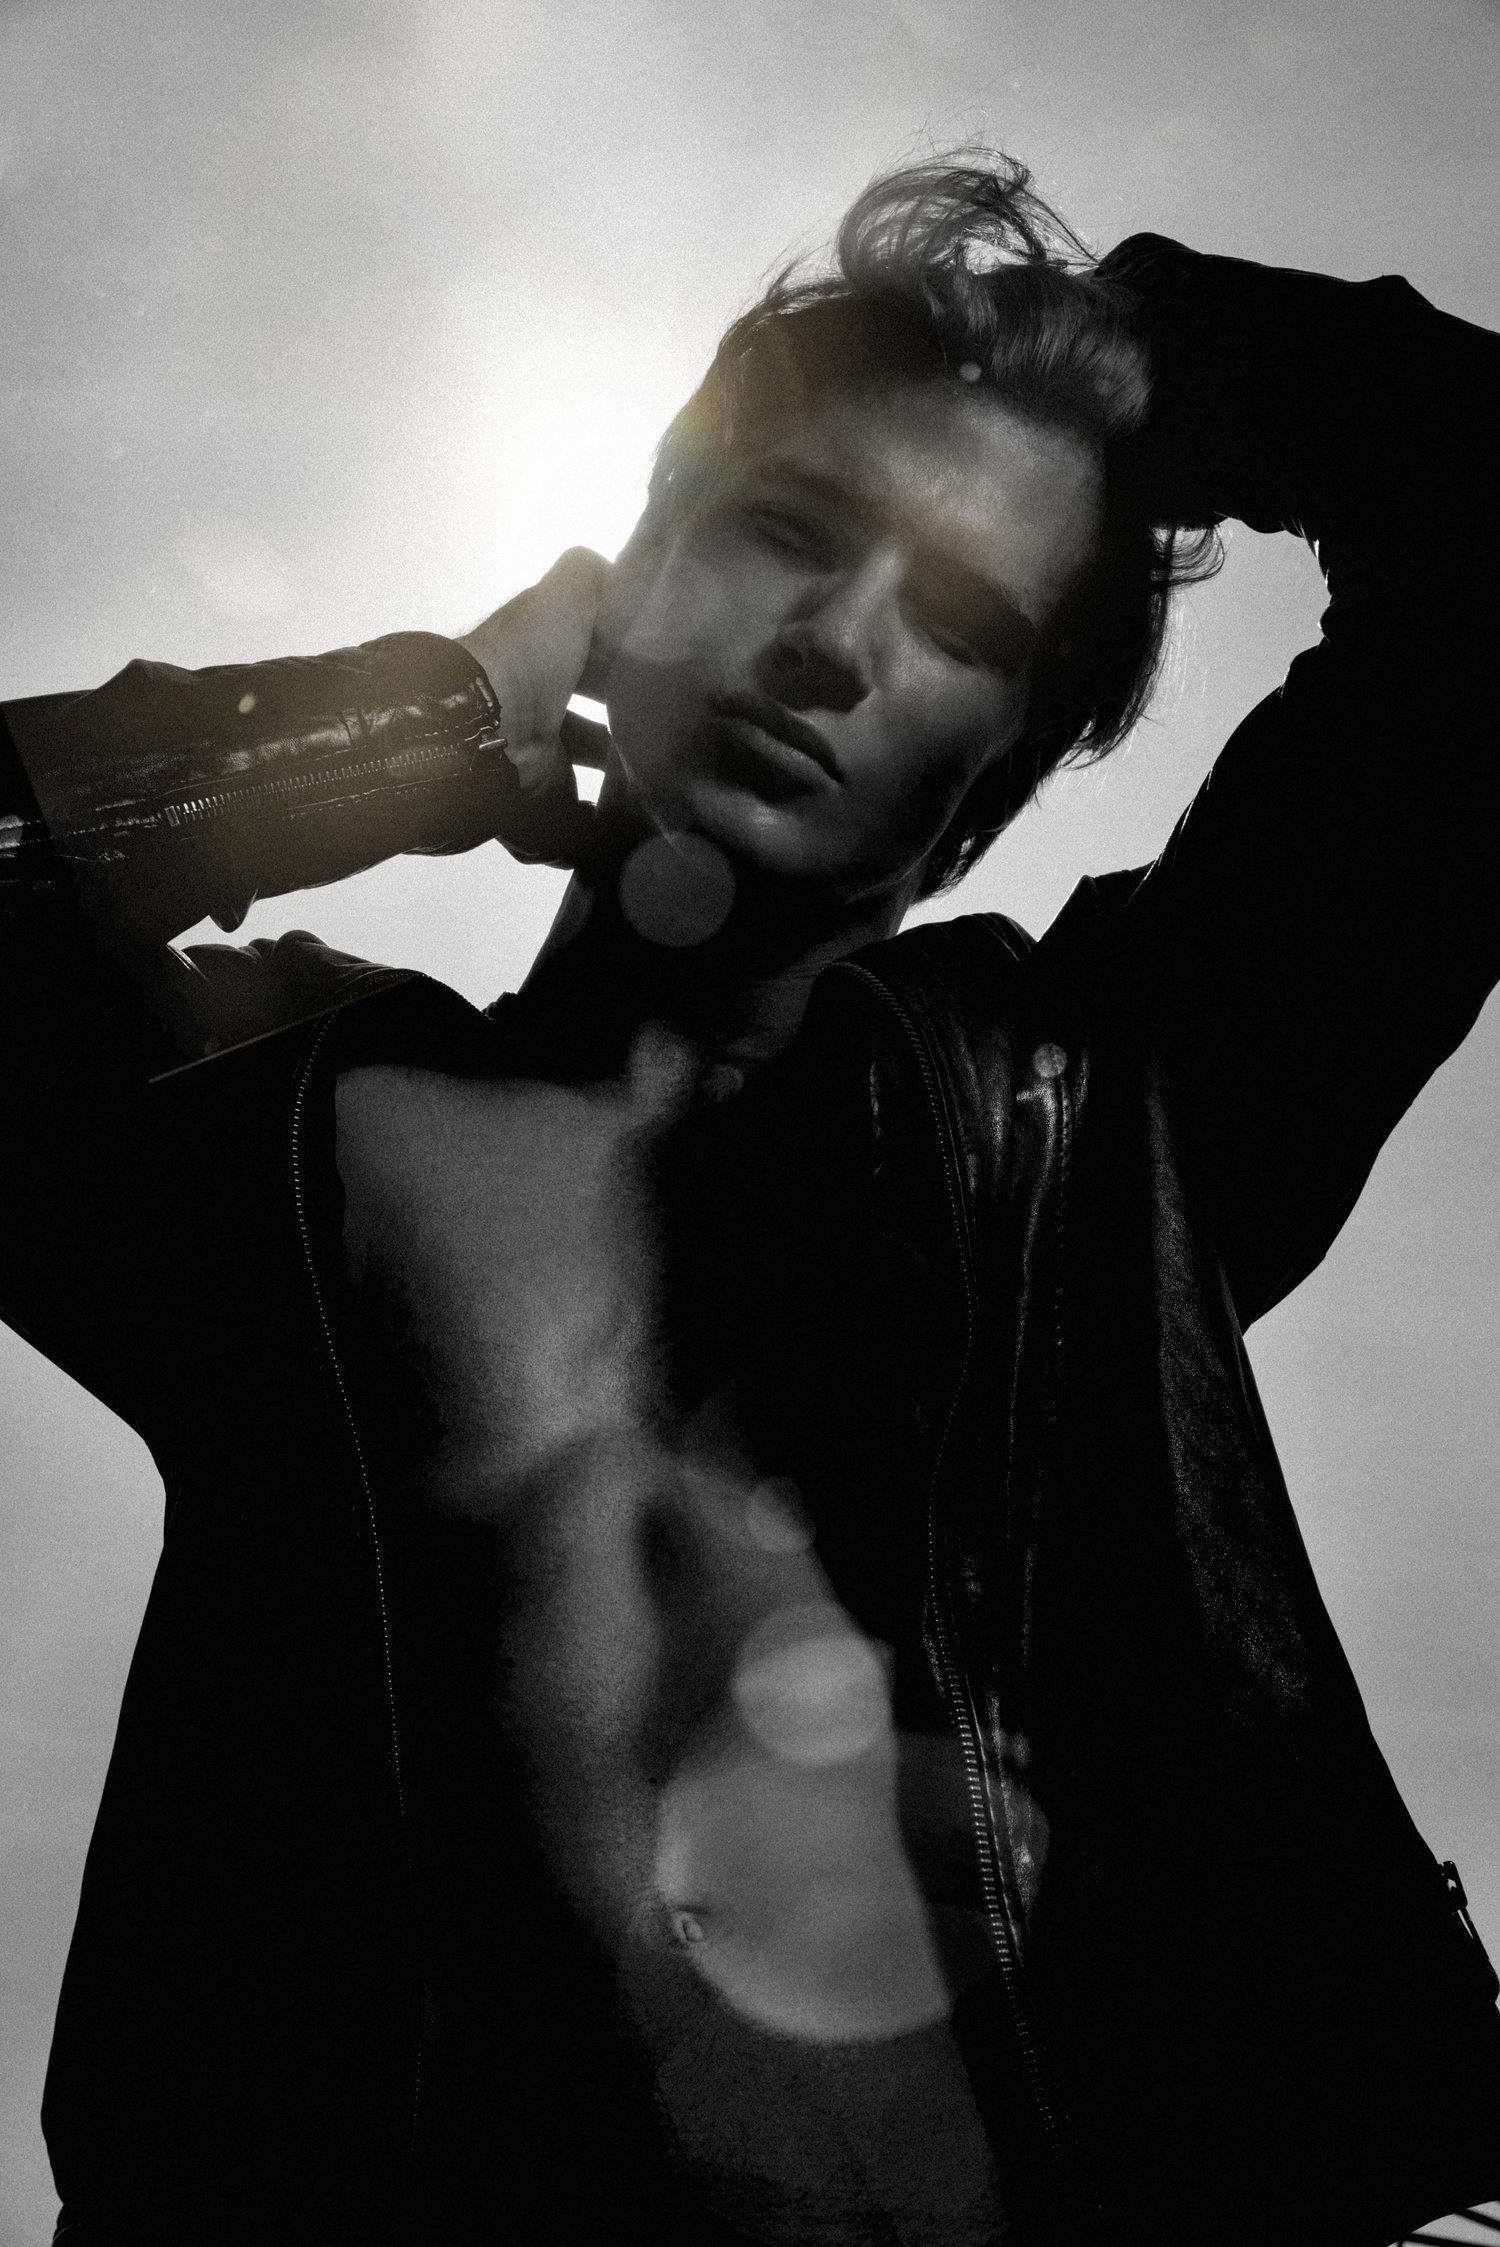 Adon Exclusive: Model Joel Willfors By Jamal Alias